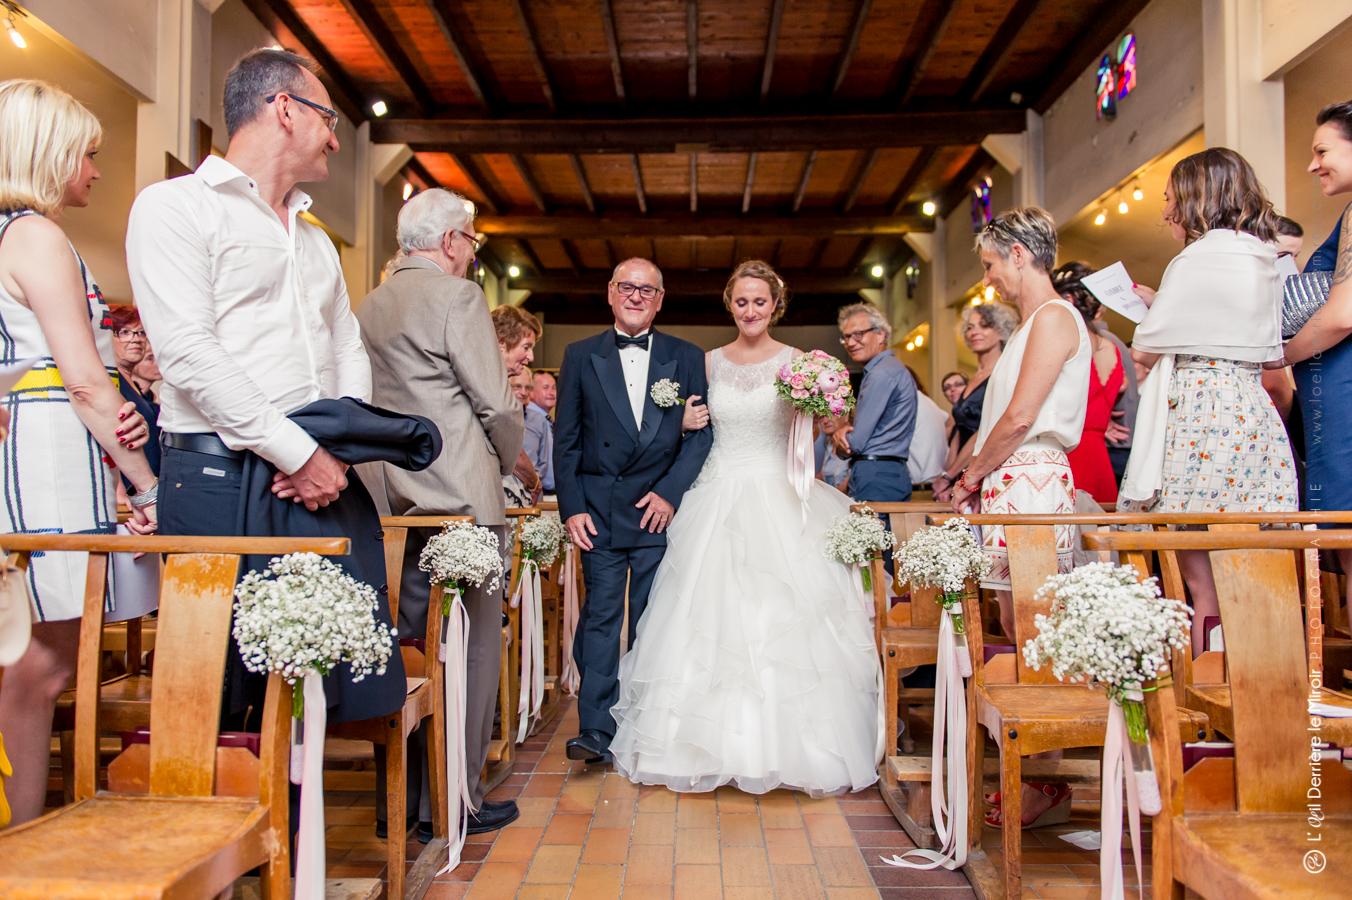 mariage-cj-vaugrenier-loeilderrierelemiroir-037